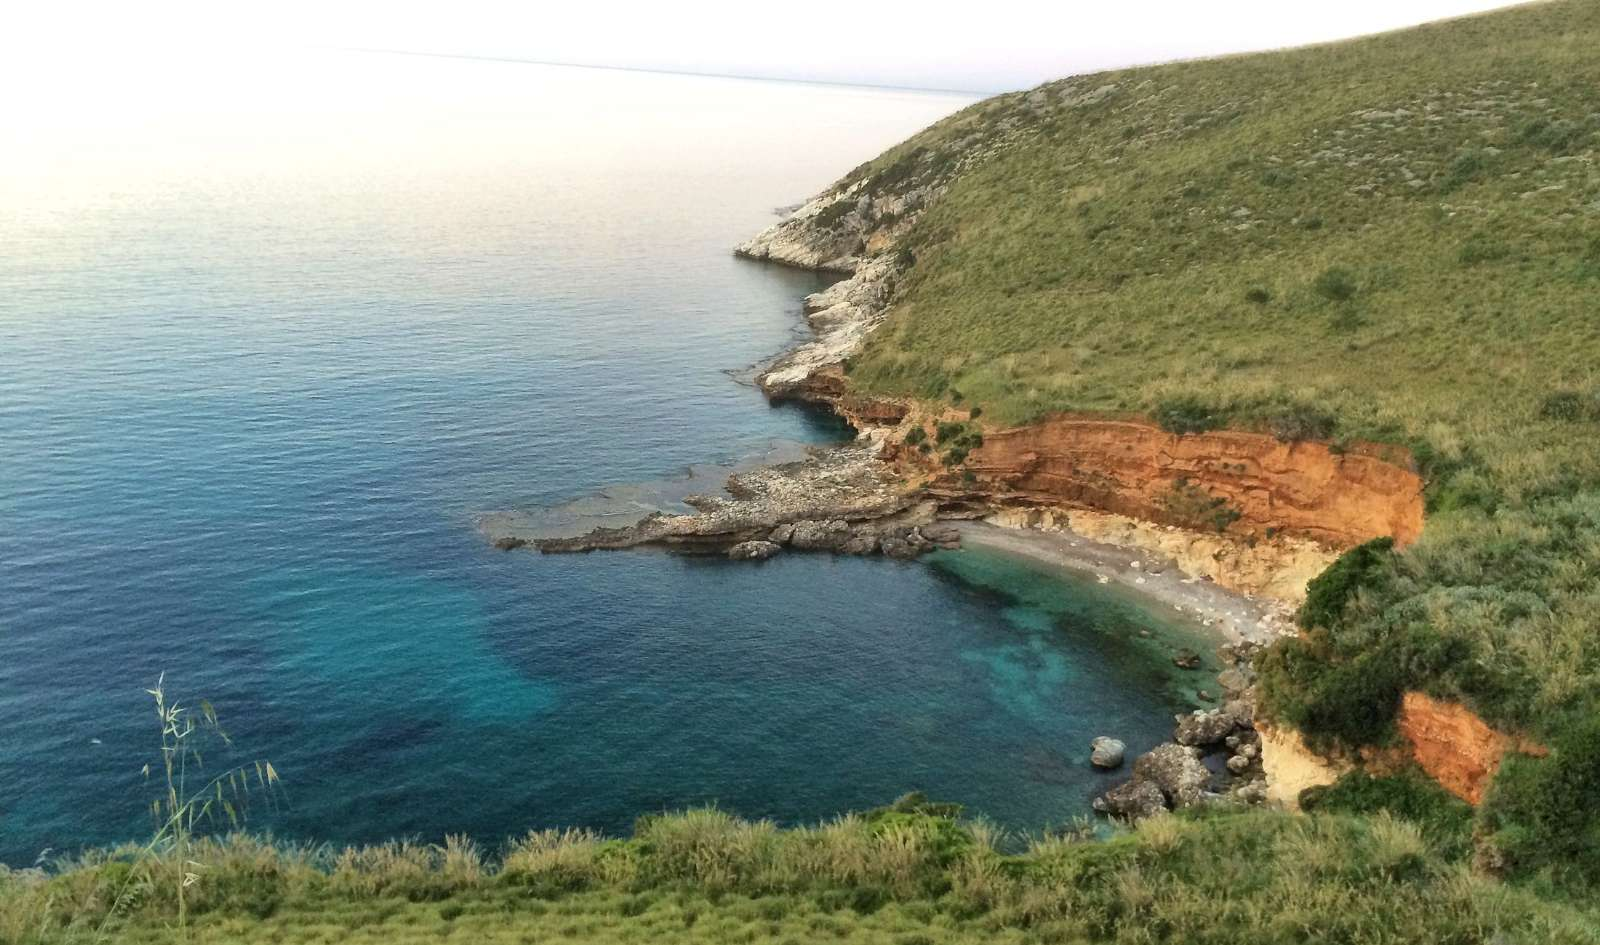 Stranden ned af klippen ved Villino dei Gabbiani